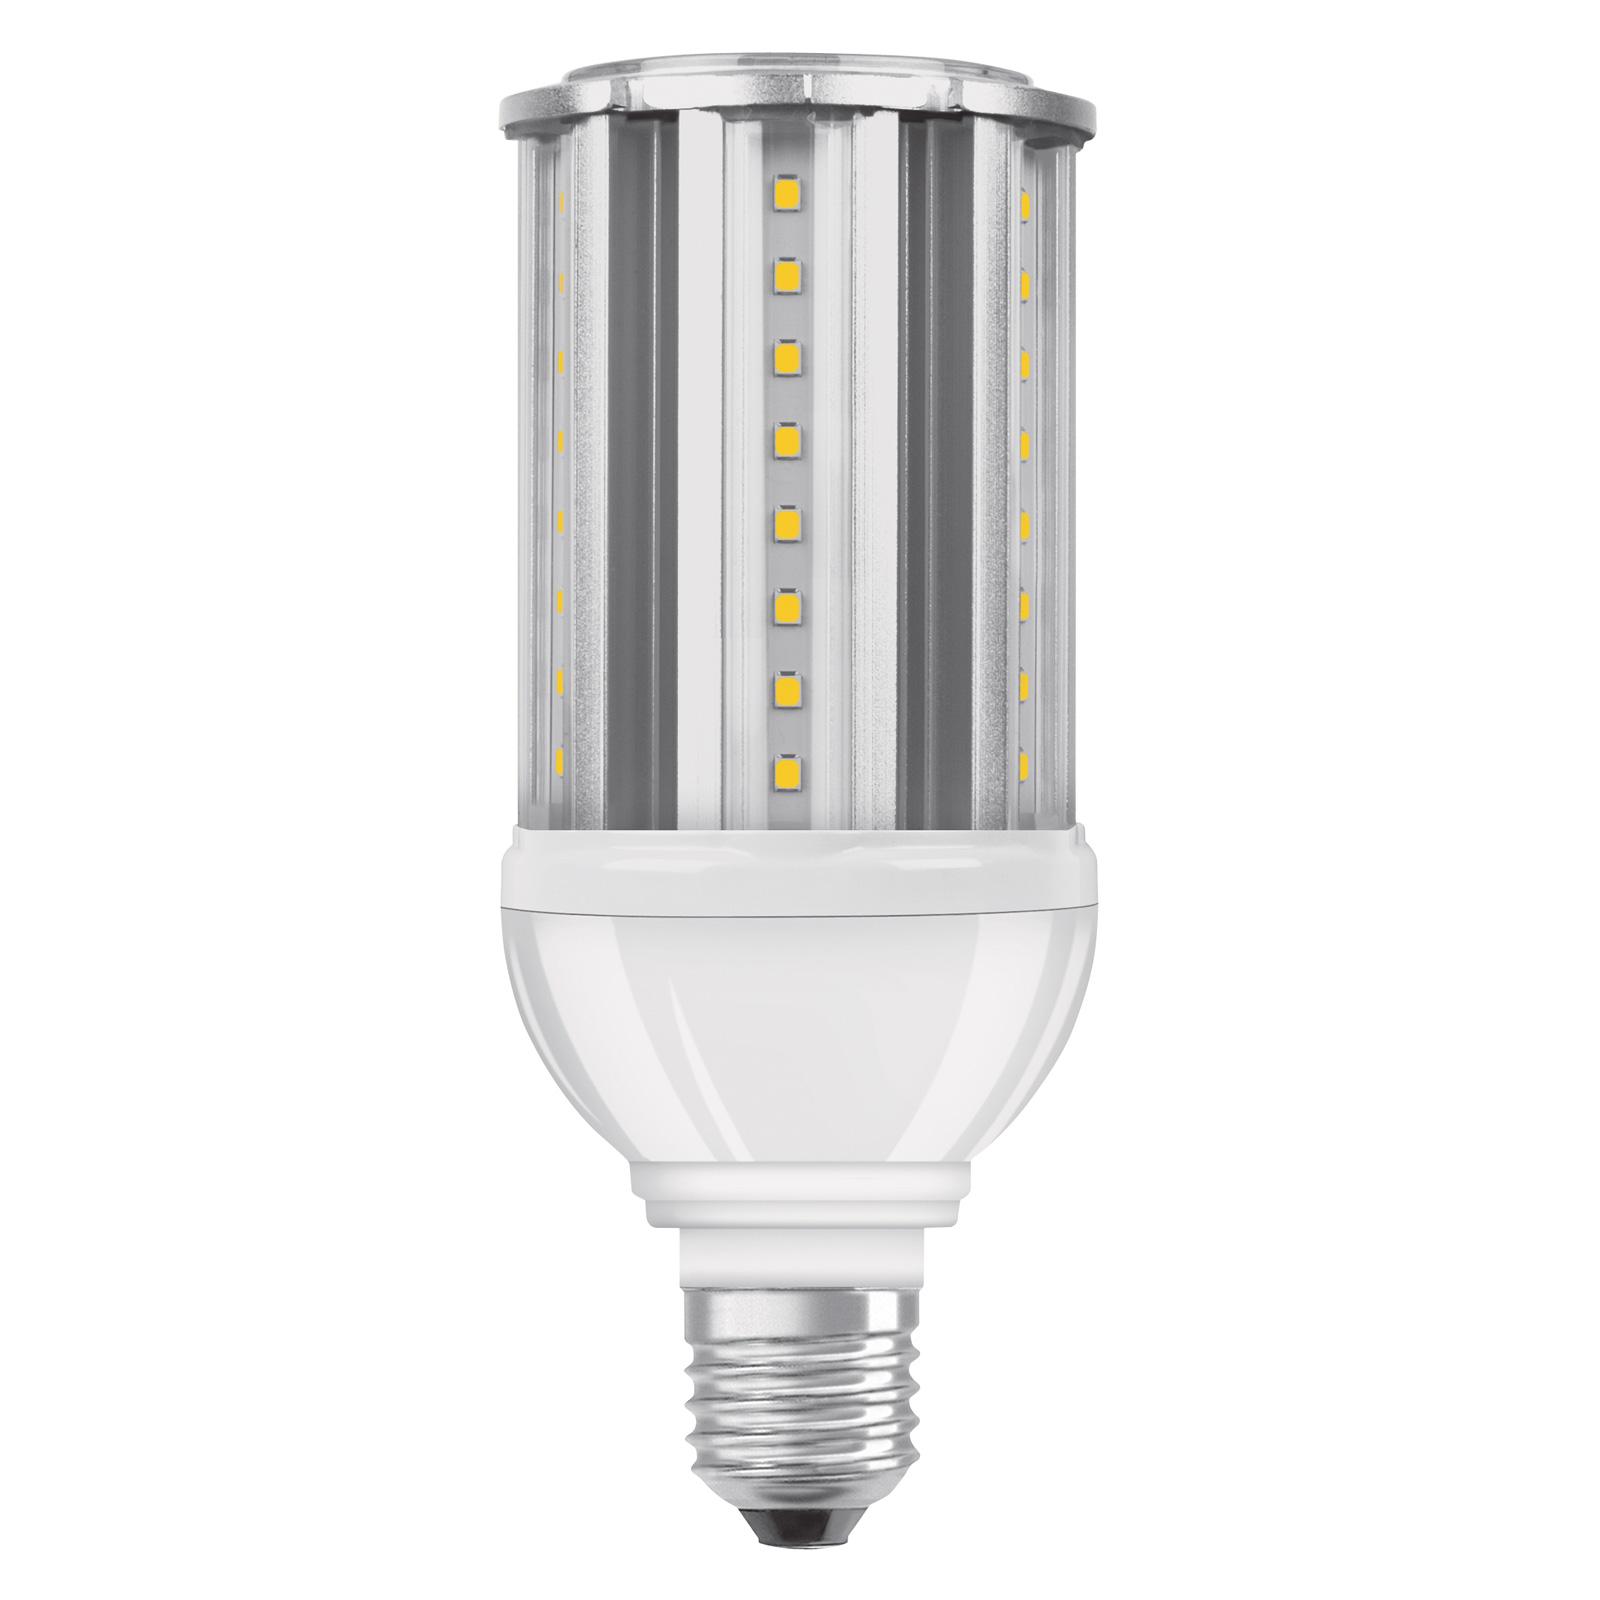 Osram parathom hql led lampe e27 18 watt 2000 lumen for Led lampen 0 3 watt